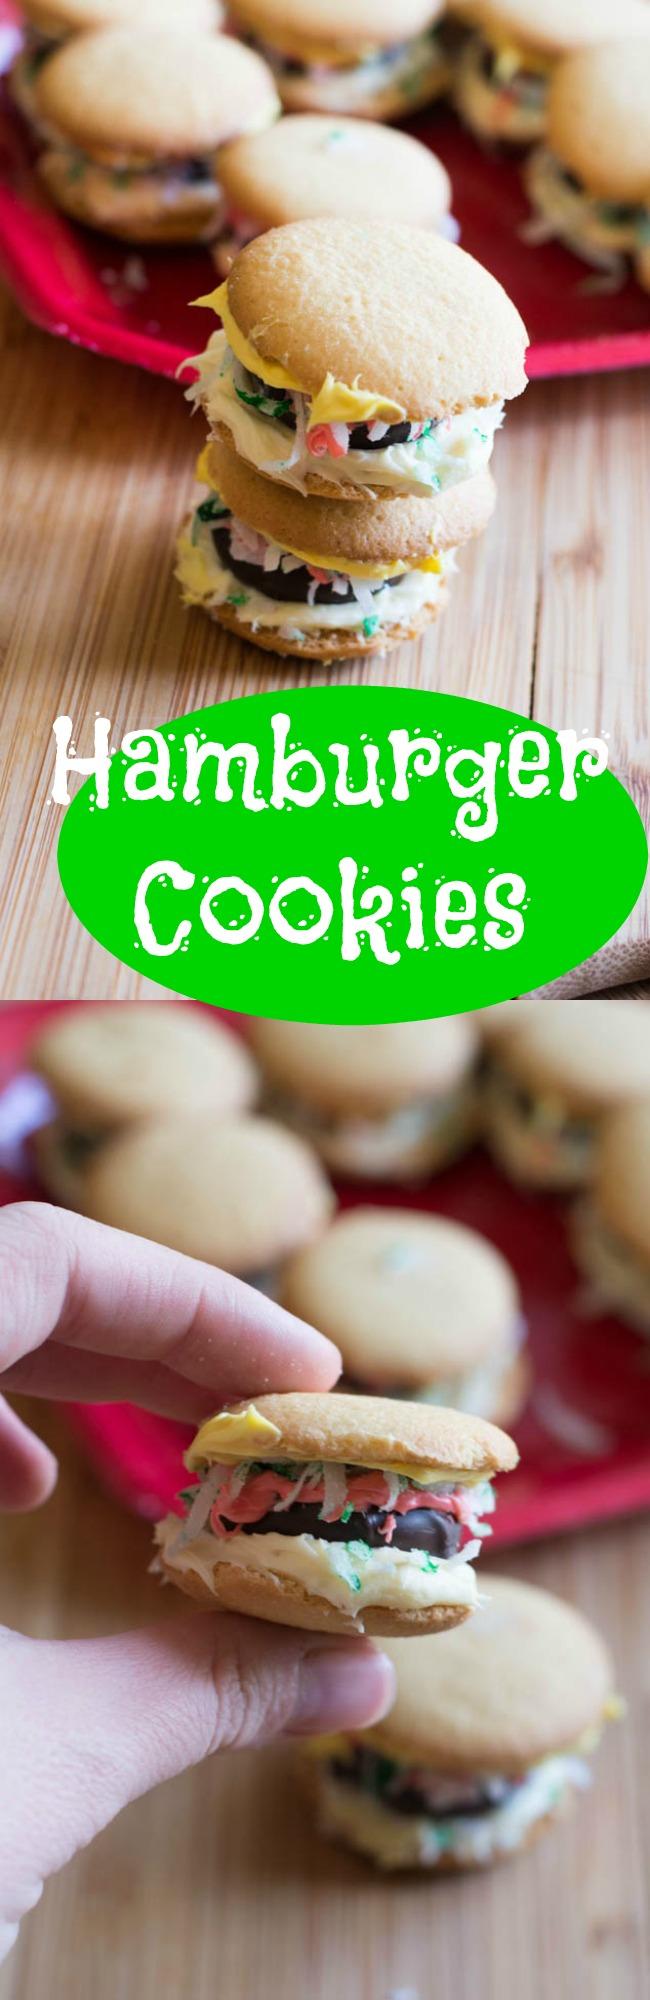 hamburgercookies